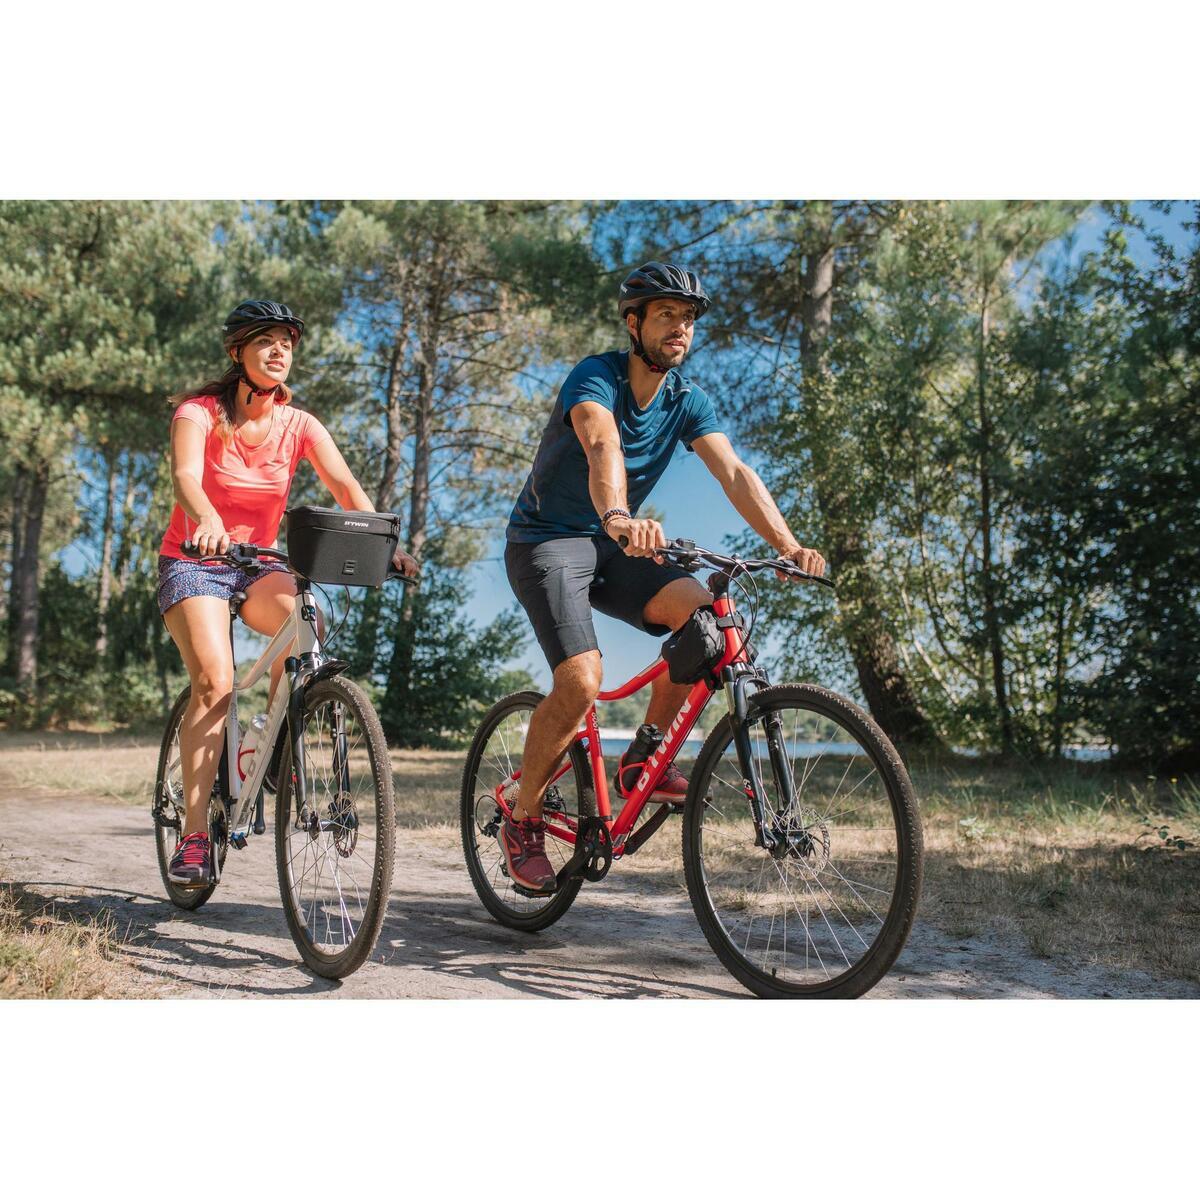 Bild 2 von Cross Bike 28 Riverside 500 Alu rot